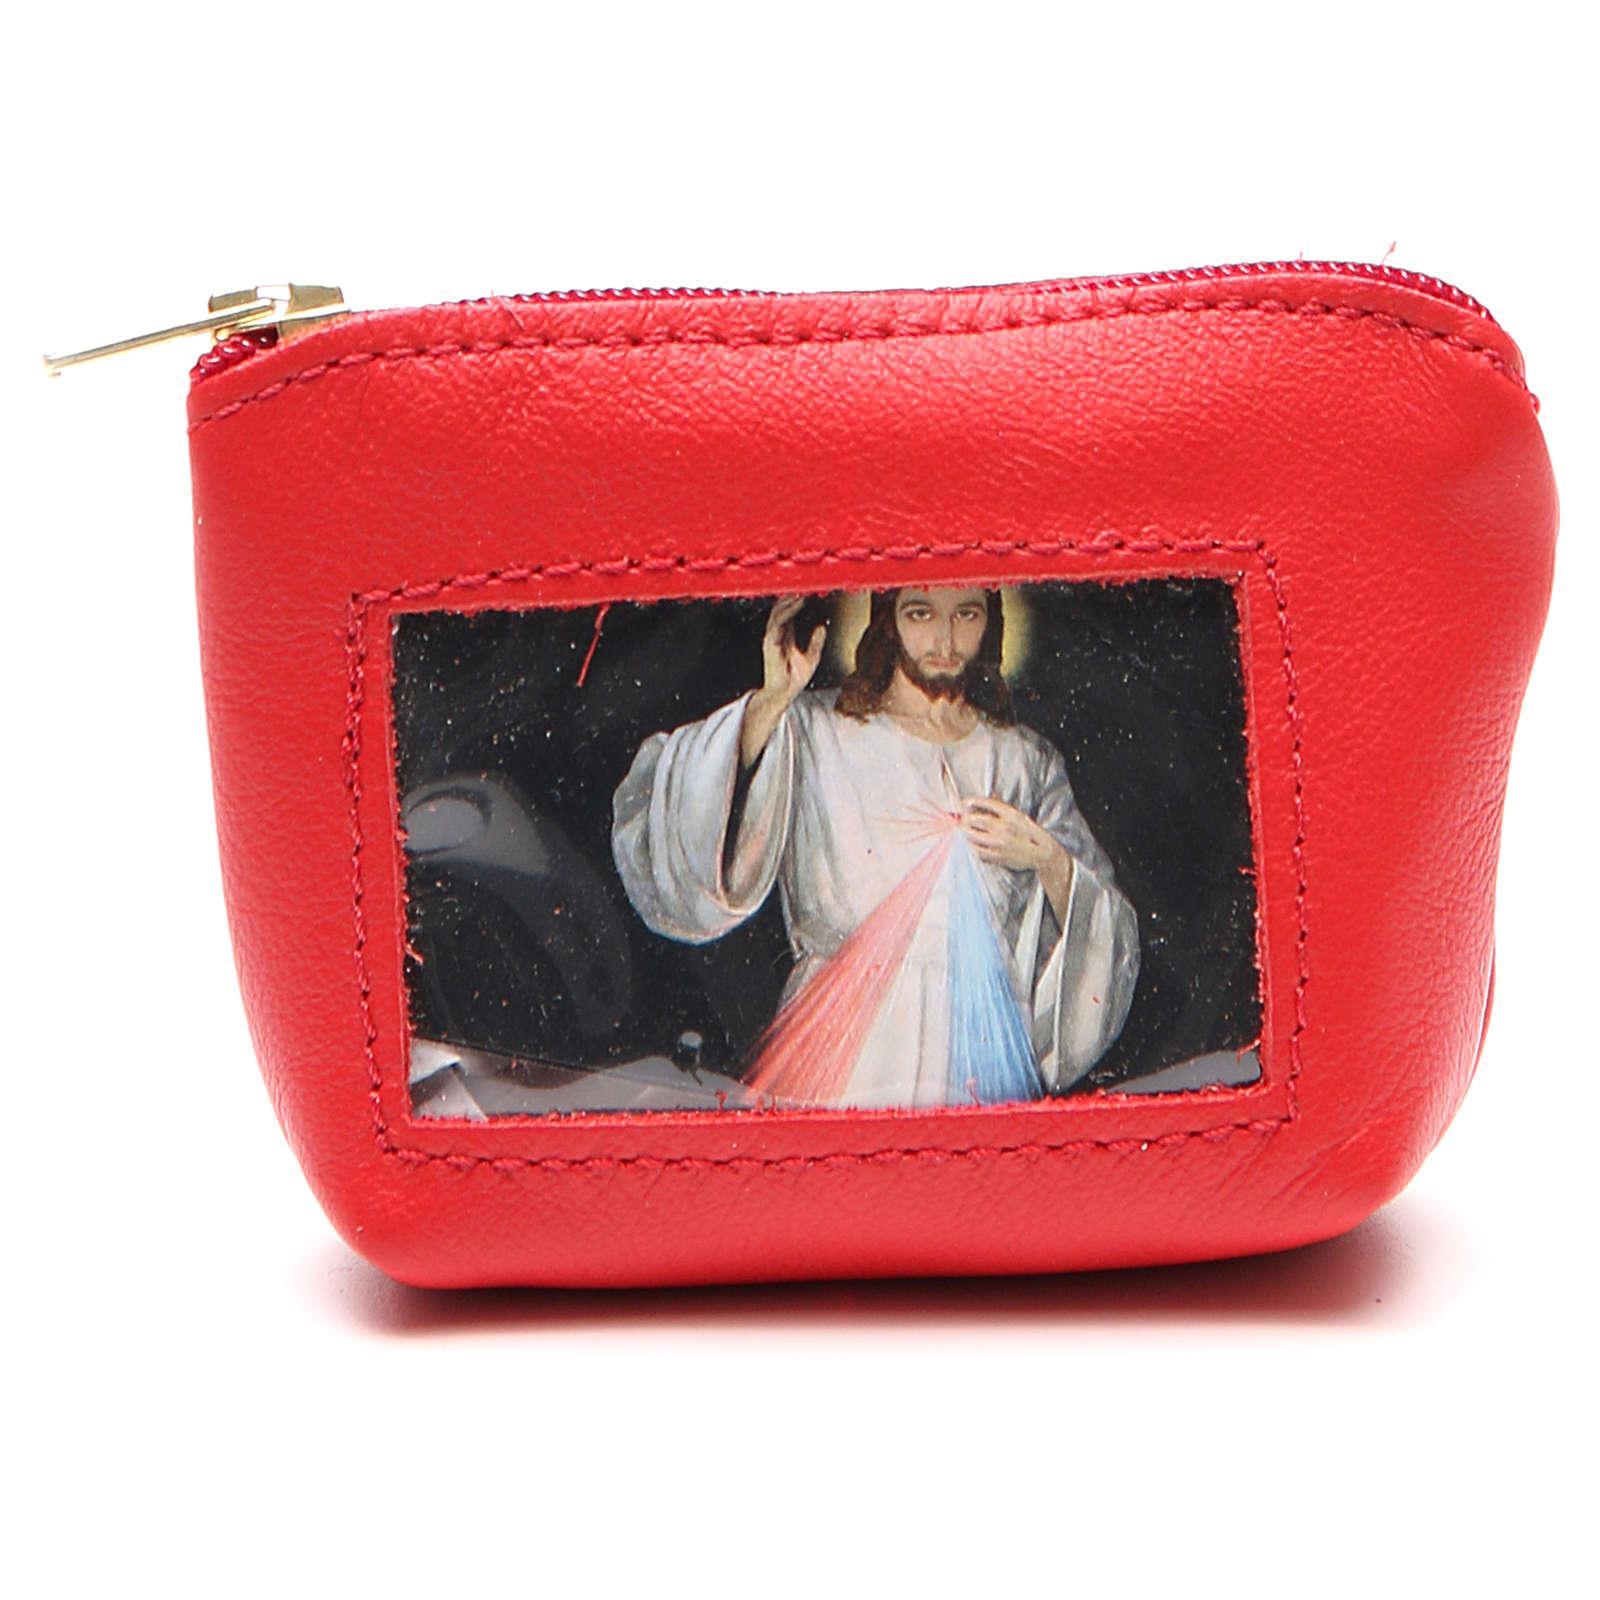 STOCK Portarosario borsetta pelle rossa Giubileo 4